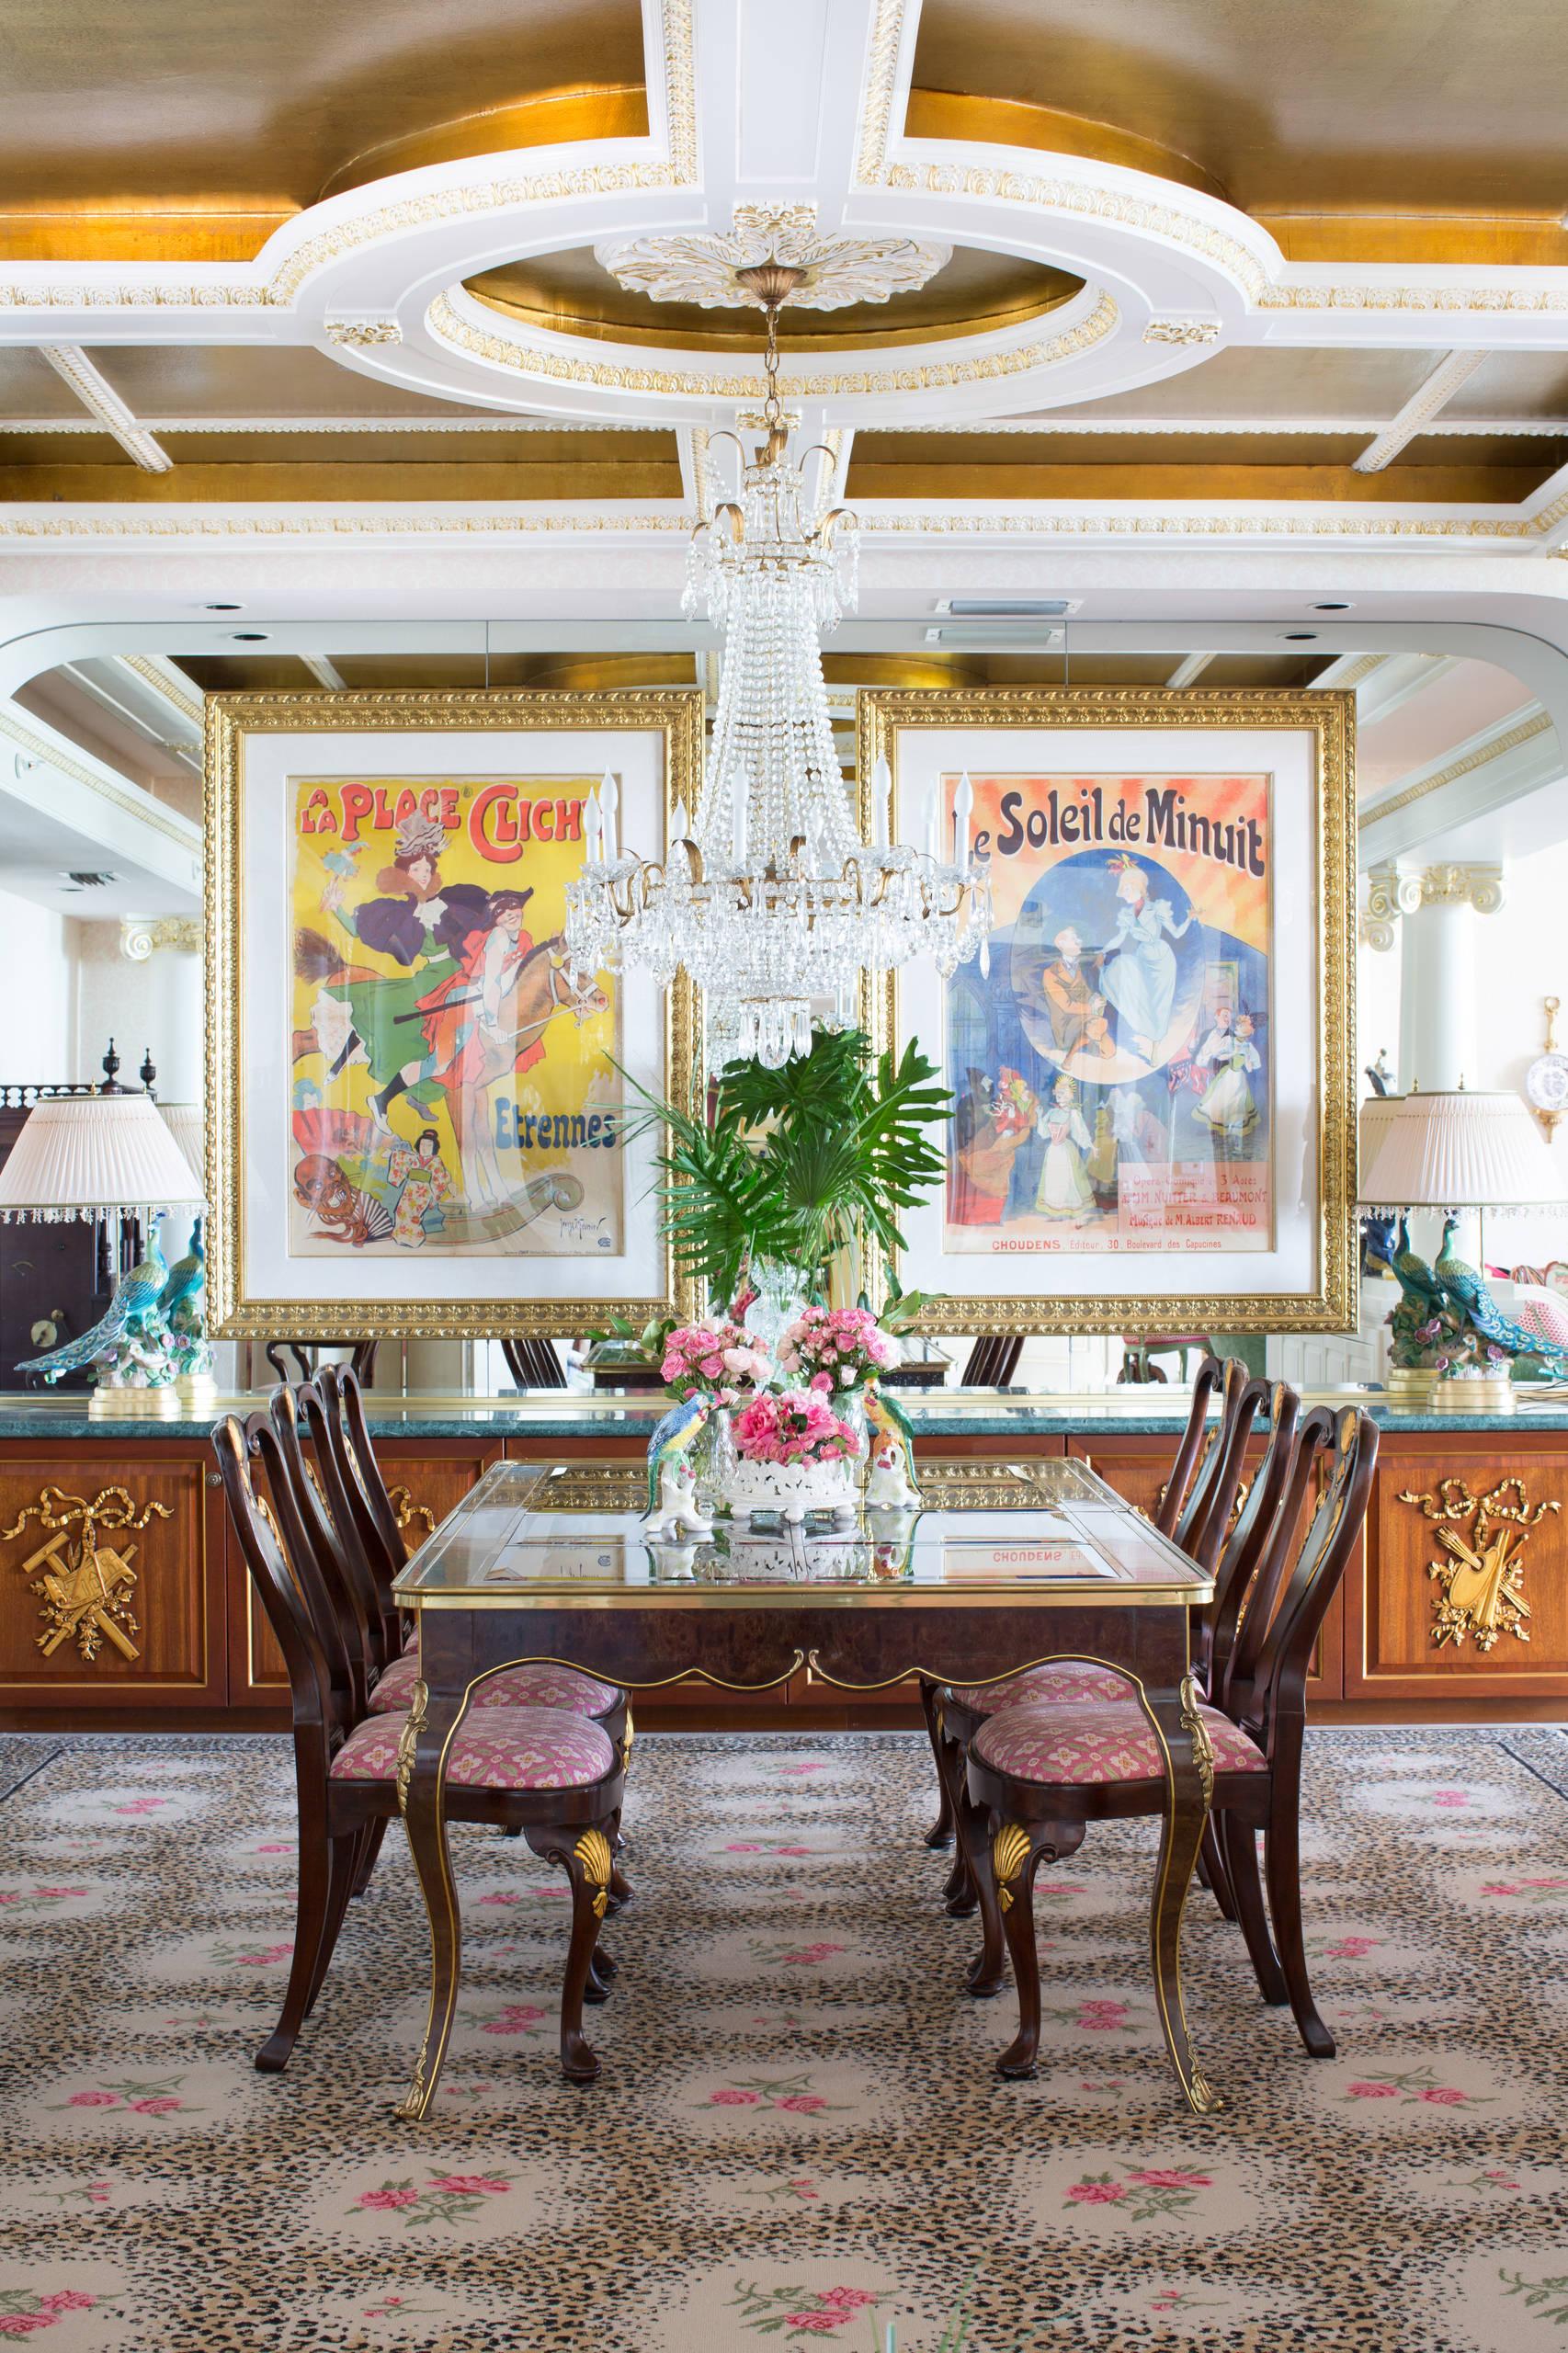 Betterdecoratingbible Home Interior Design Interior